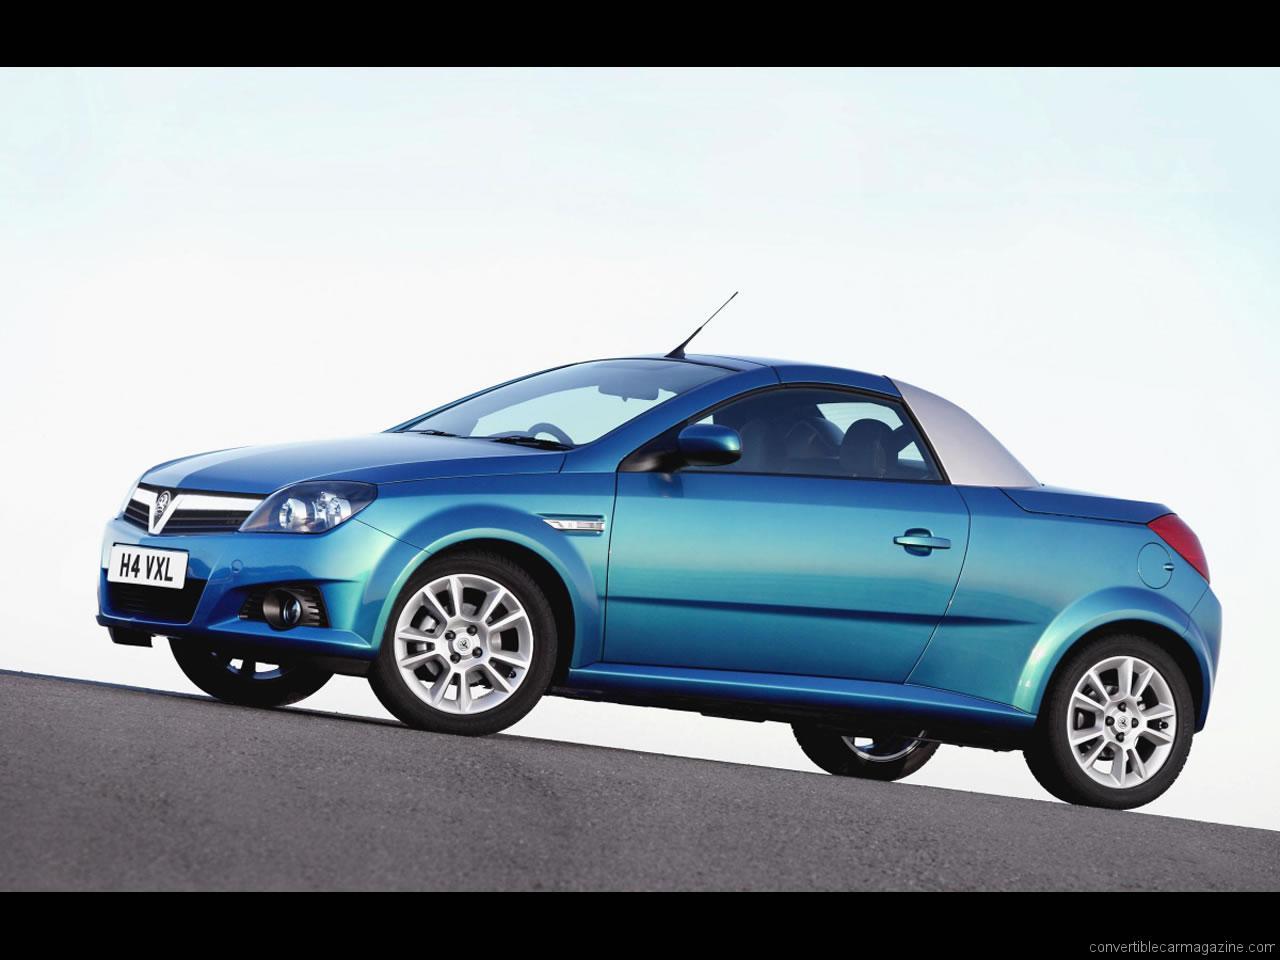 Kit de frein Vauxhall TIGRA TwinTop pas cher